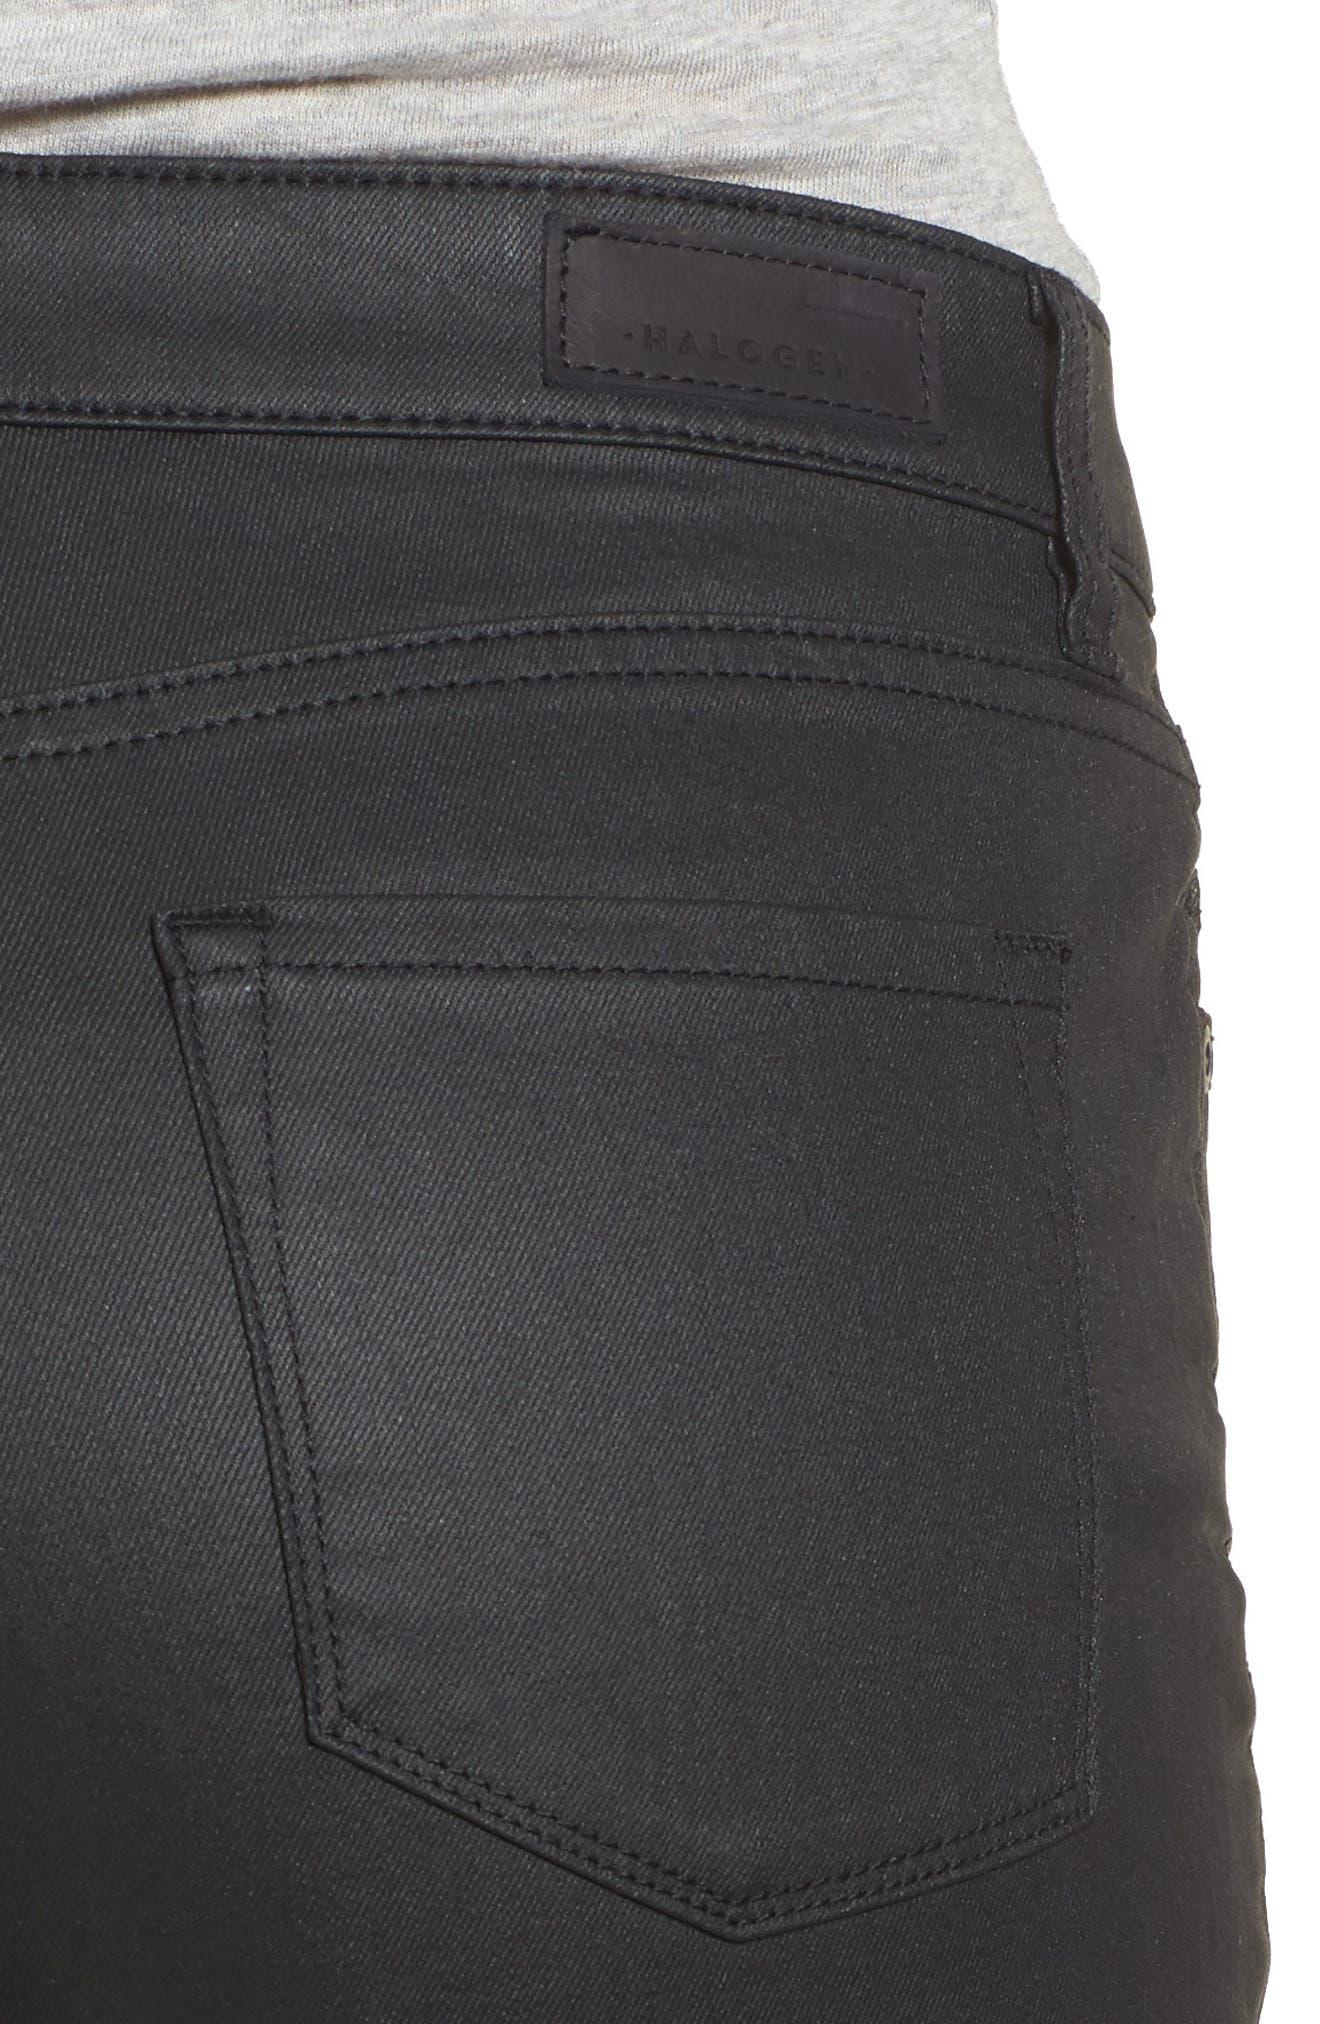 Coated Skinny Jeans,                             Alternate thumbnail 4, color,                             Black